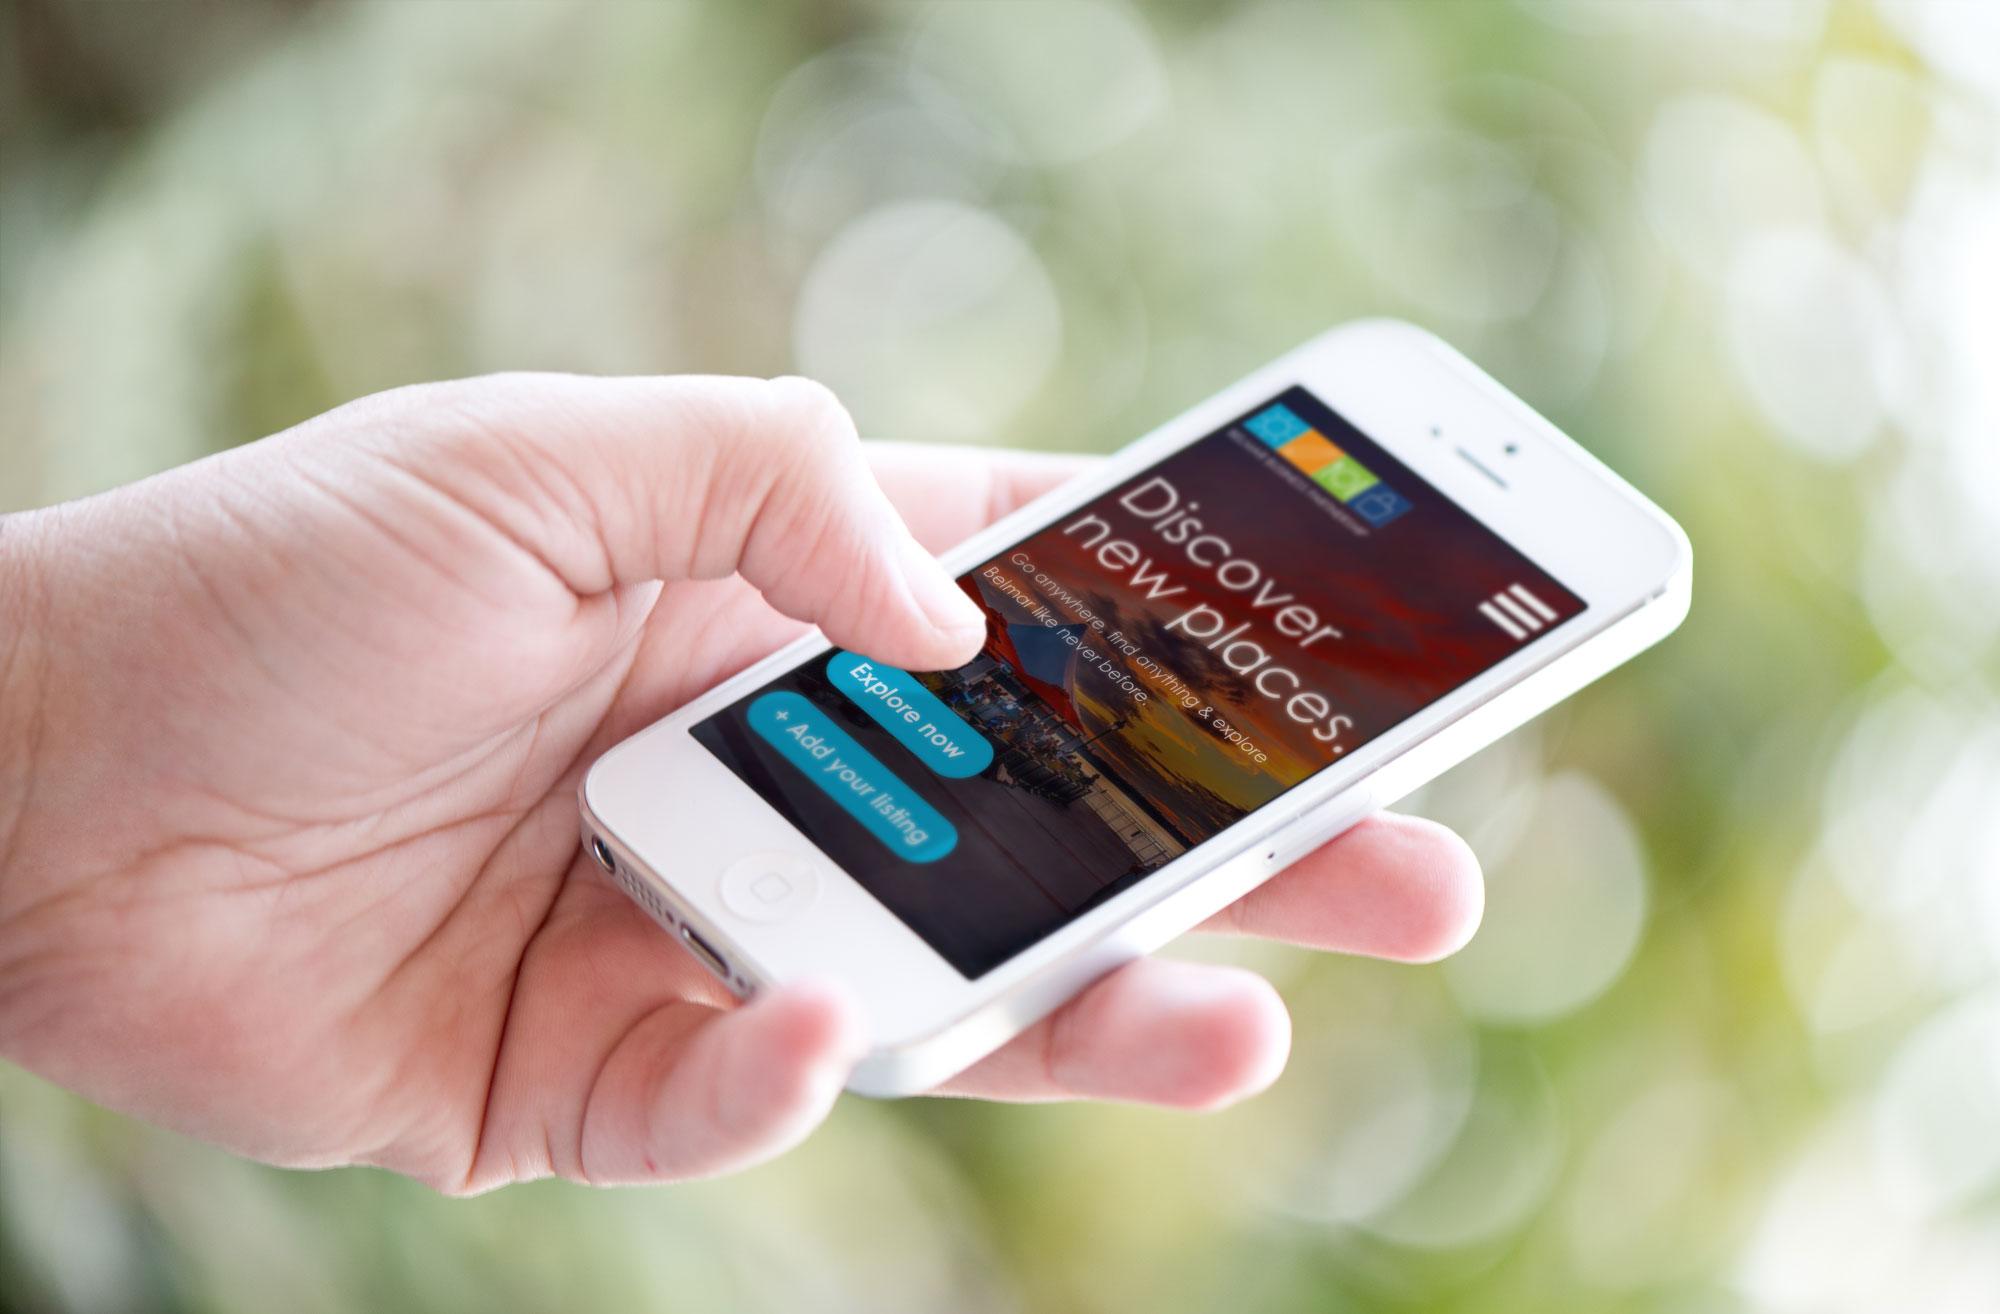 grass-creative-brand-strategy-website-design-mobile-belmar-business-partnership.jpg